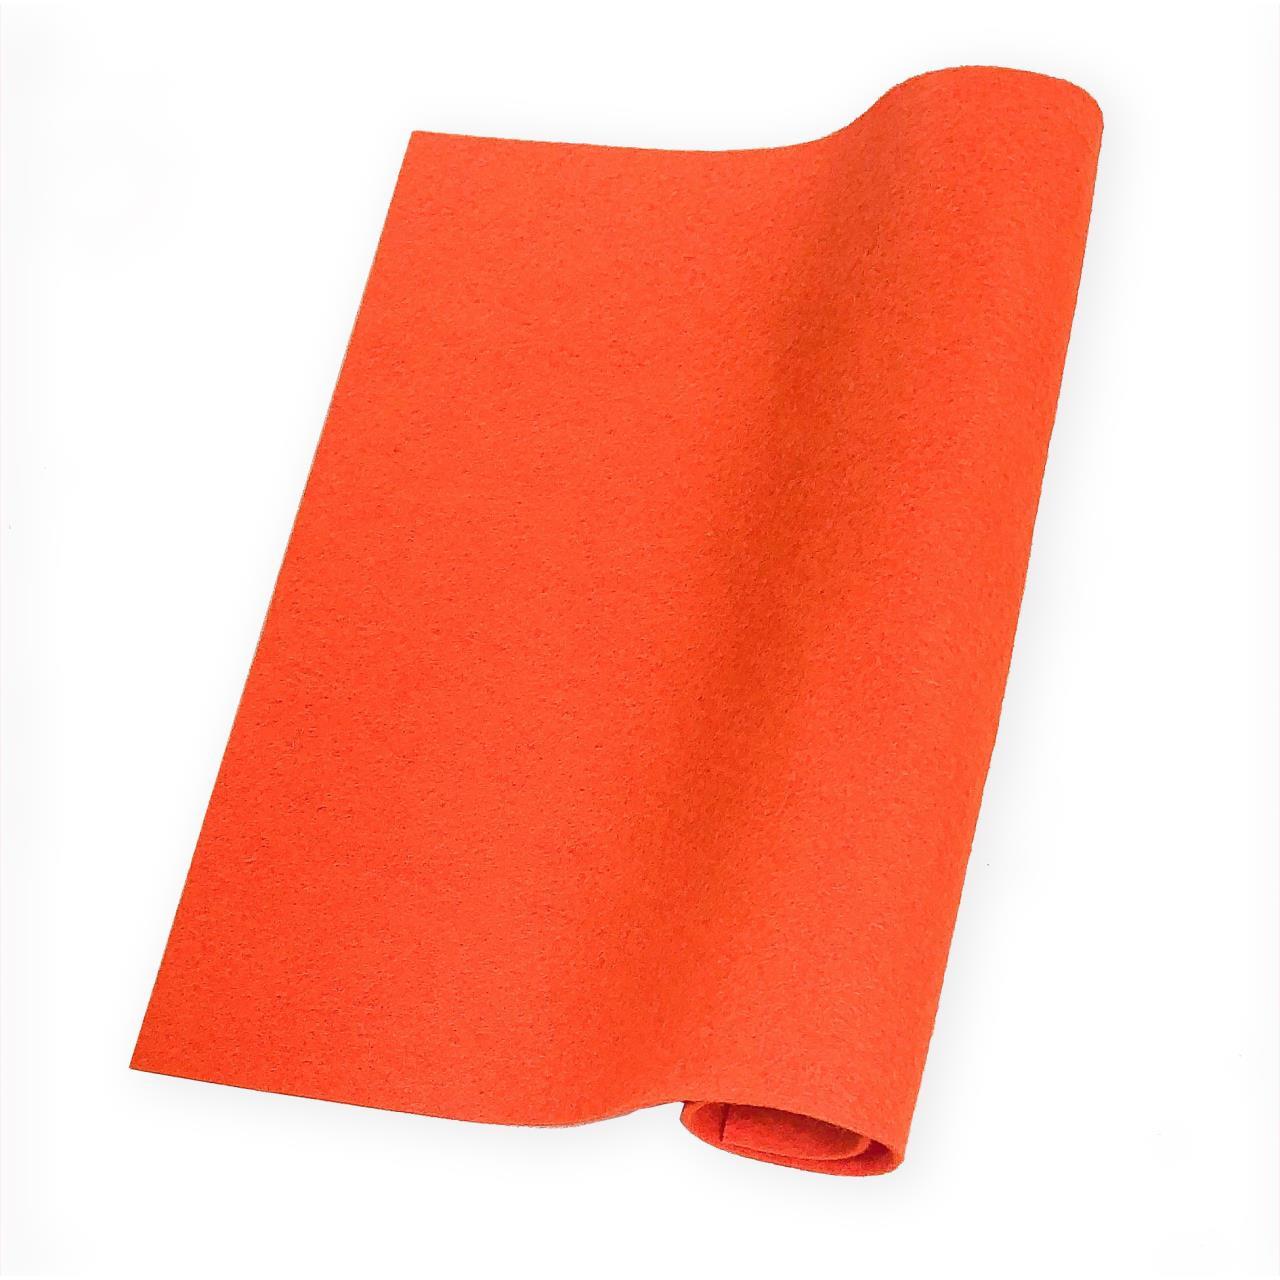 Tangerine, Essentials By Ellen Wool Felt 9 X 12 - 5 Pk -